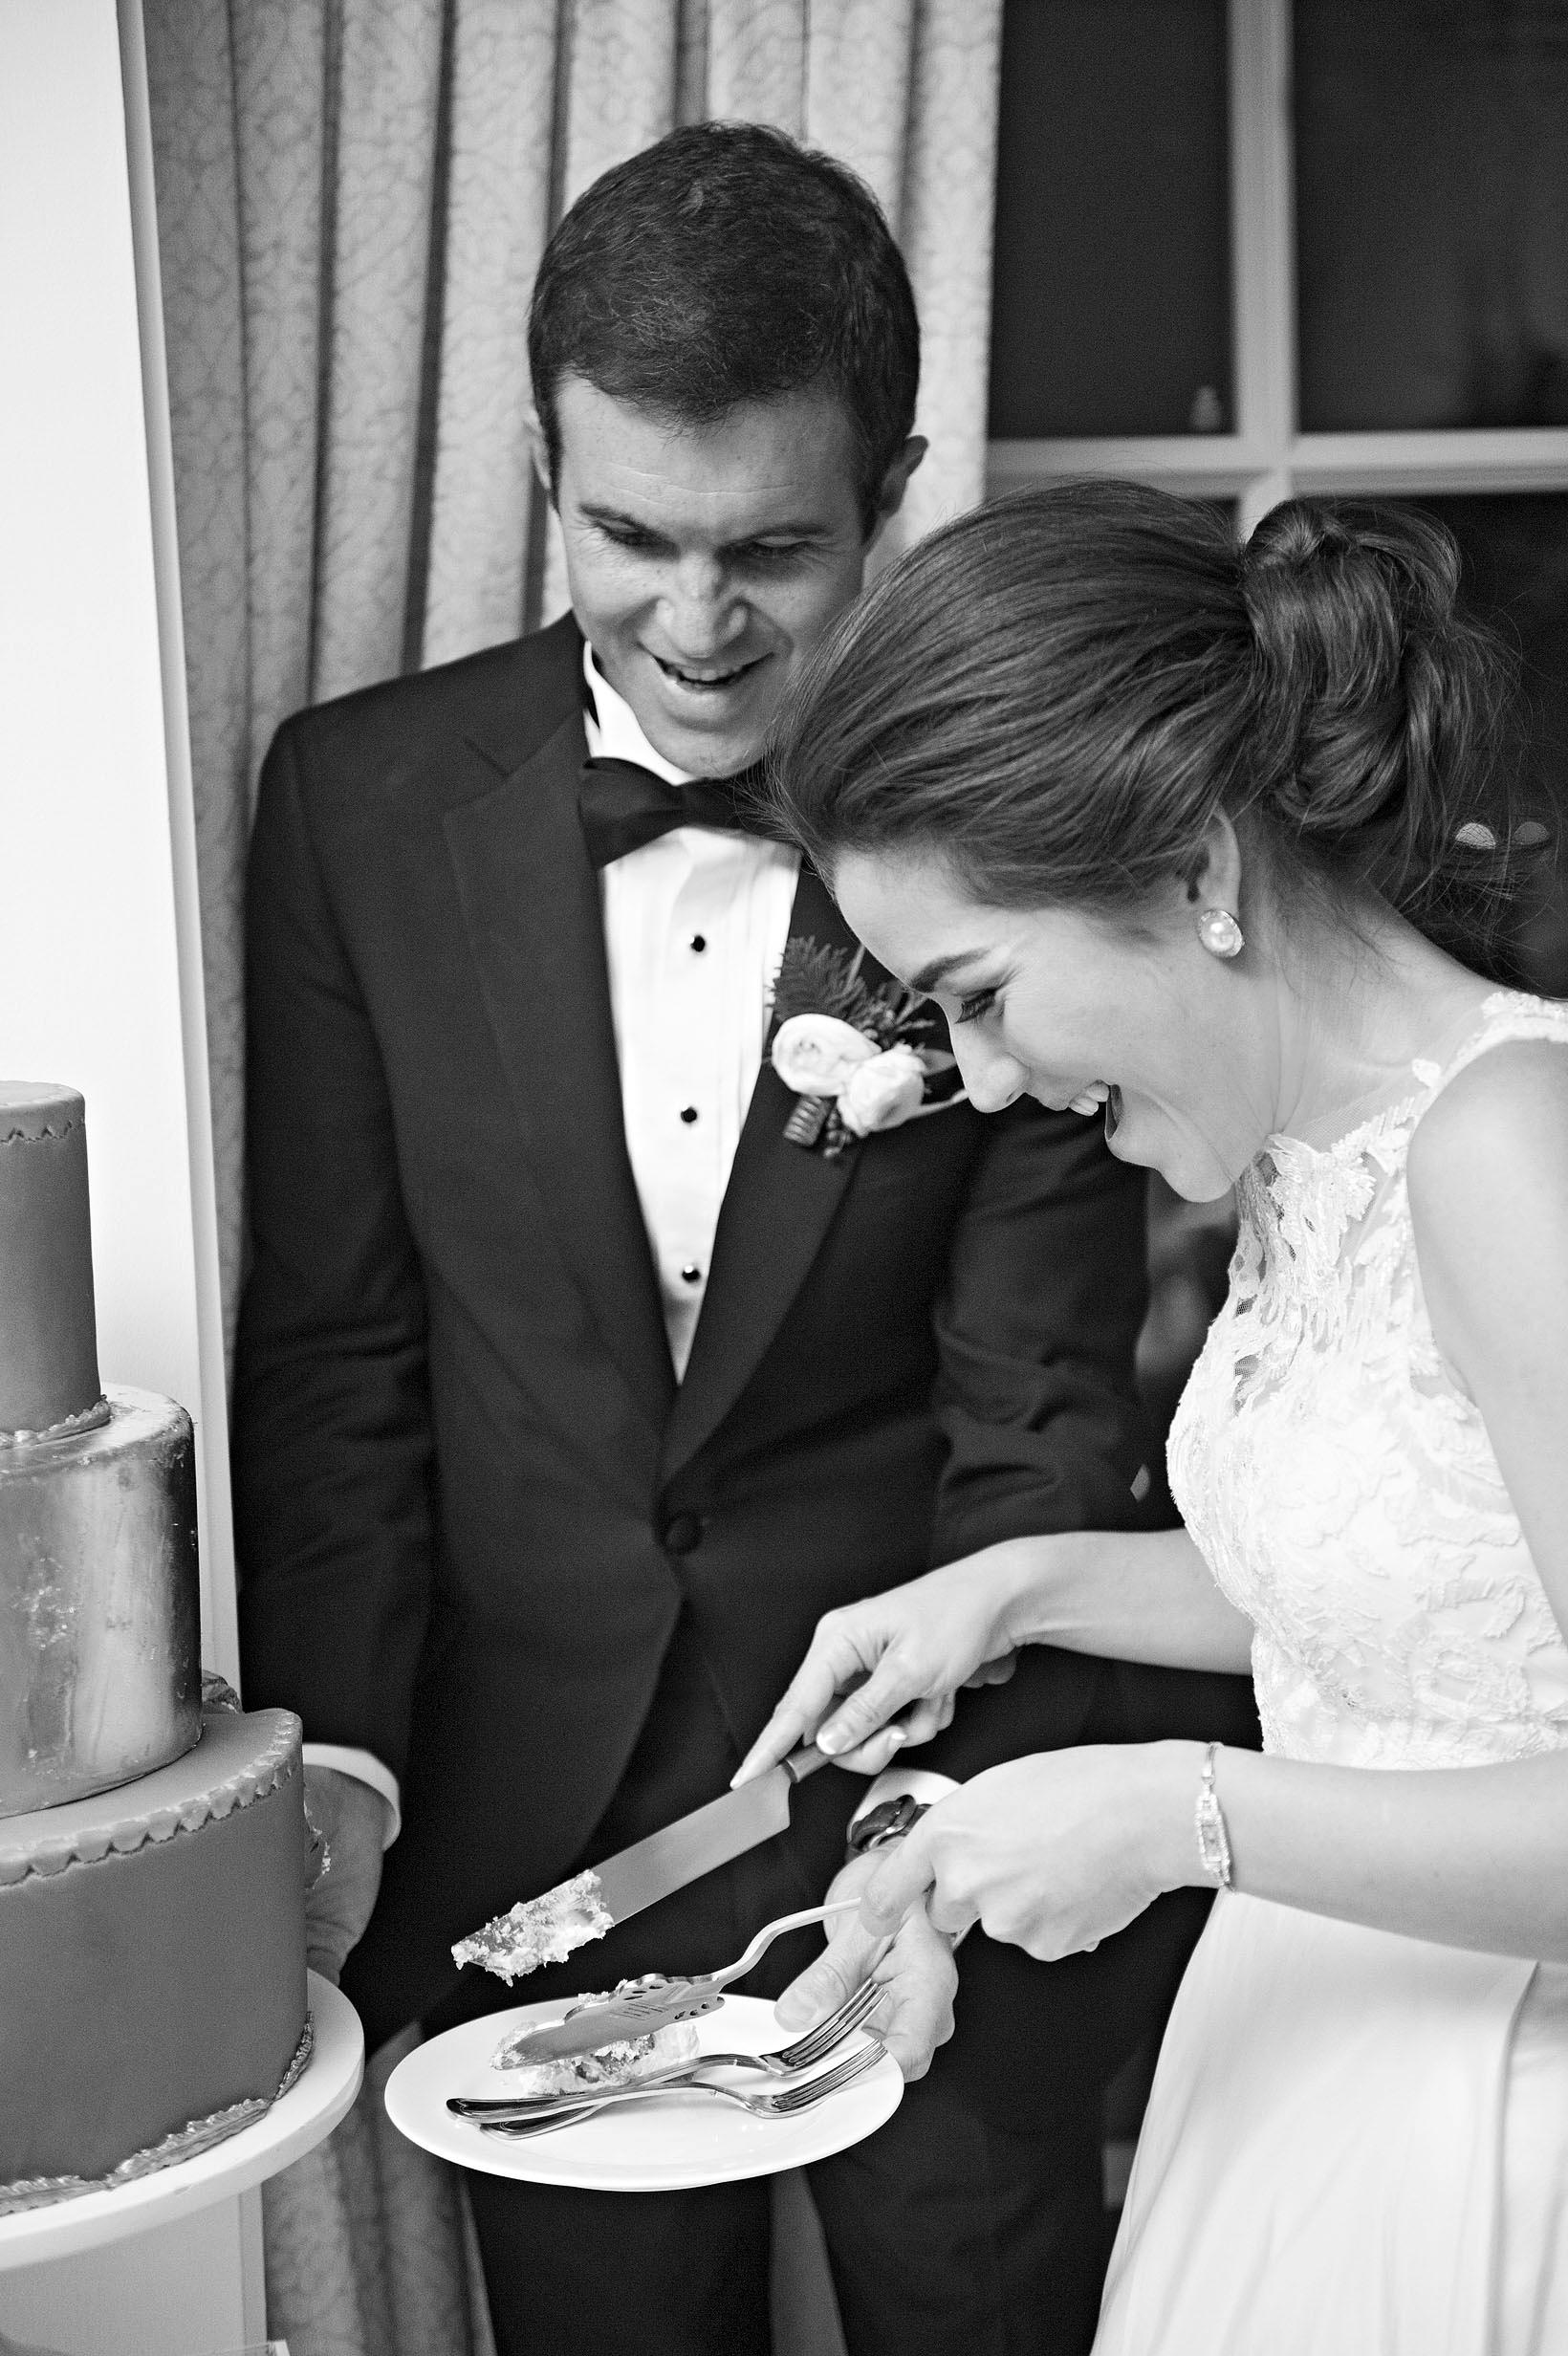 celina rob wedding virginia cake cutting